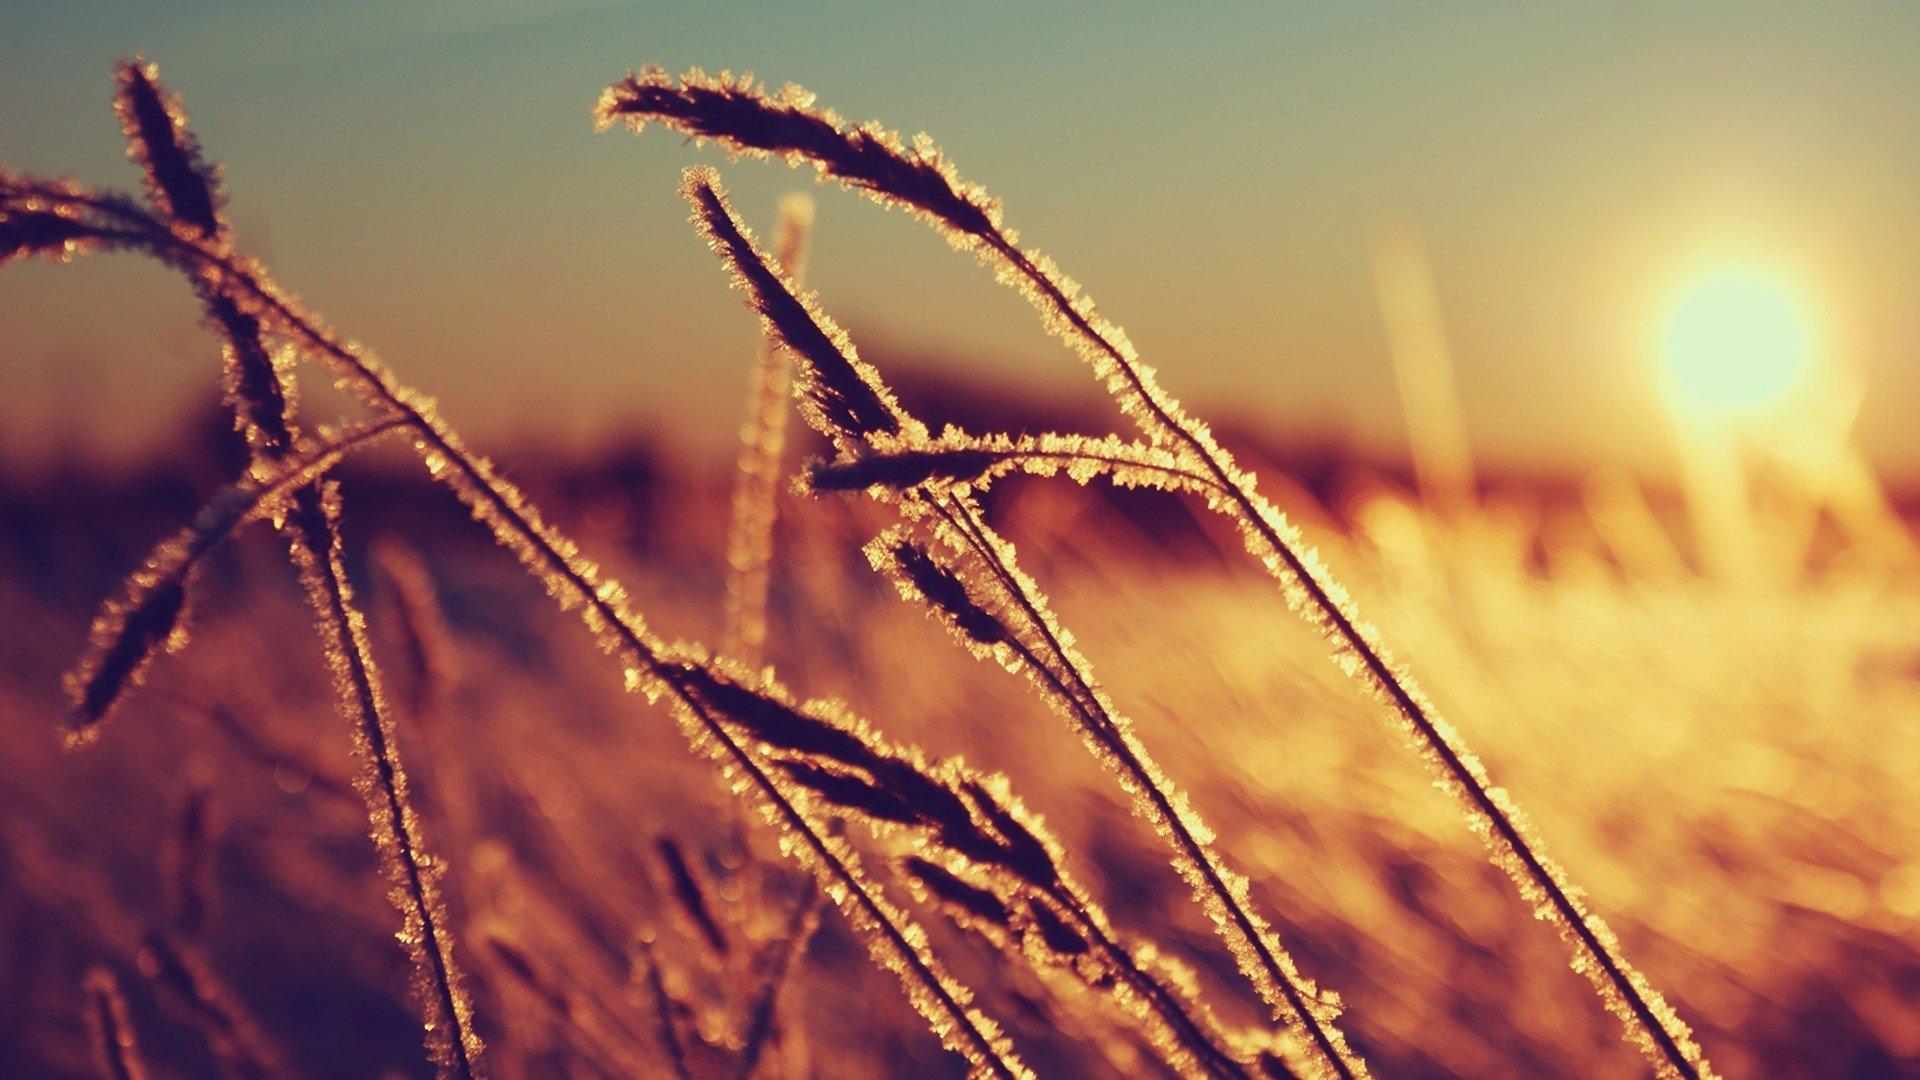 Ears Tag wallpapers: Field Clouds Ears Sun Grass Sunset Sky Corn ...